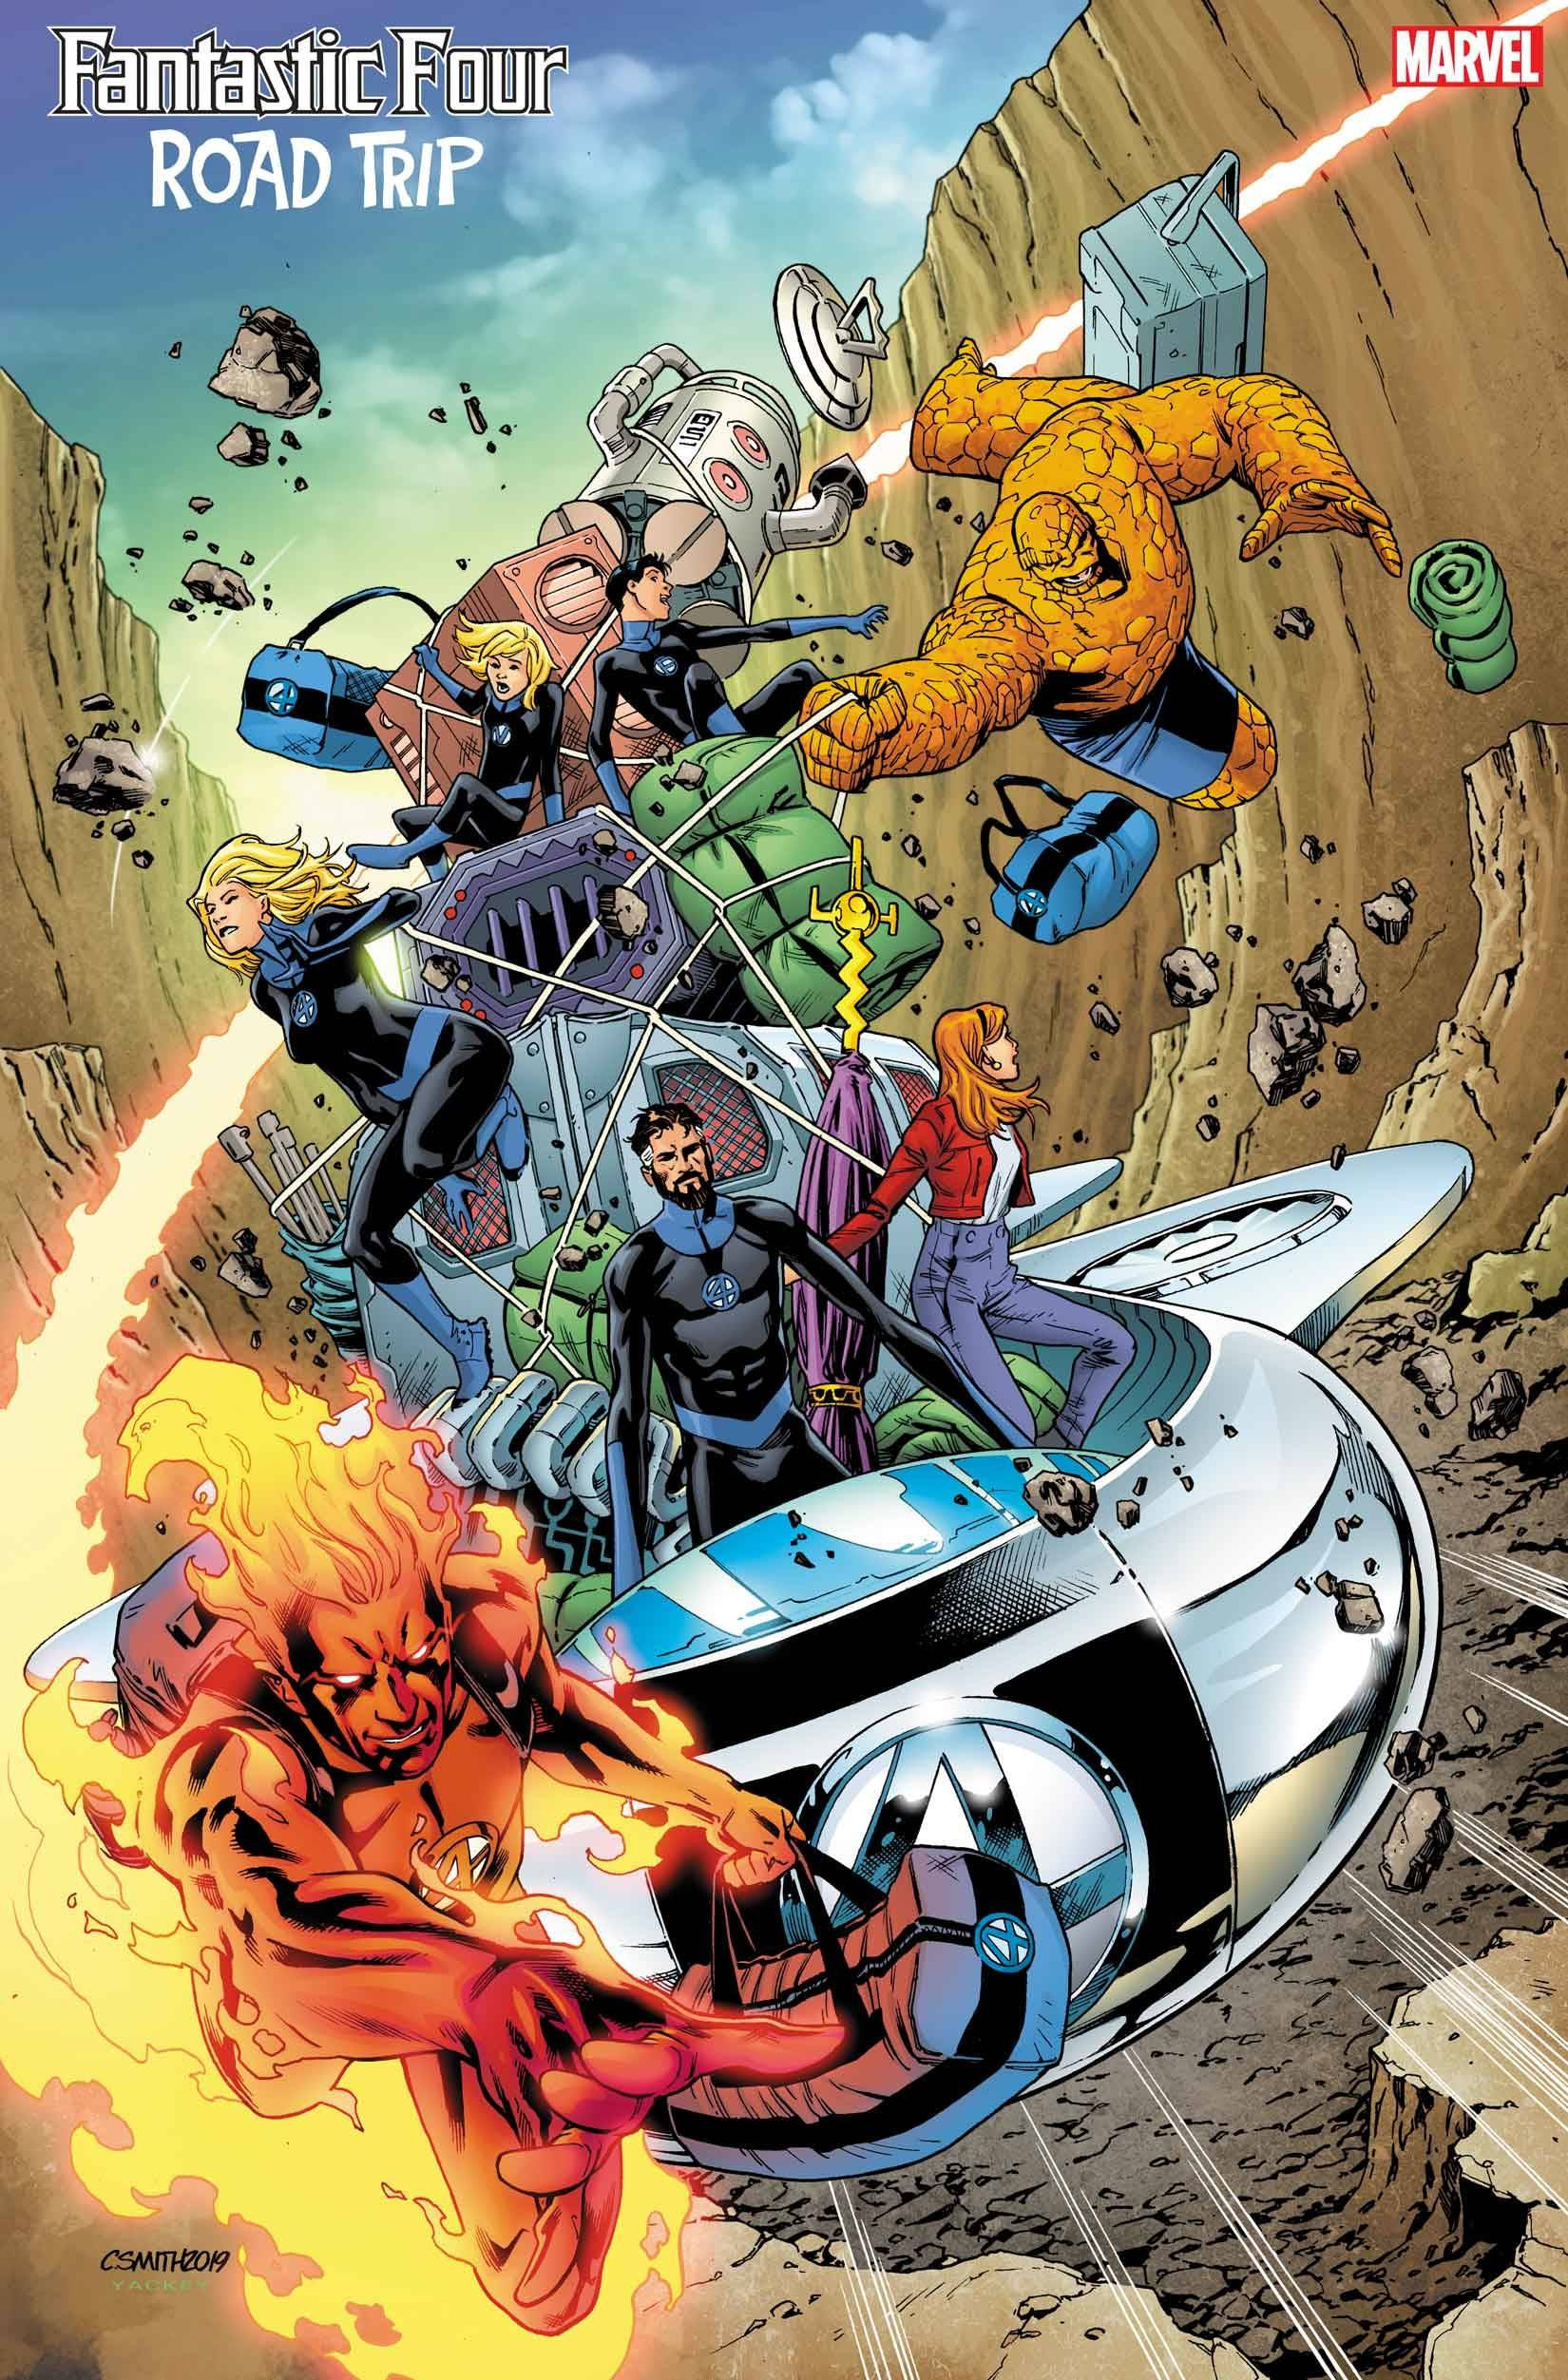 Fantastic Four: Road Trip #1